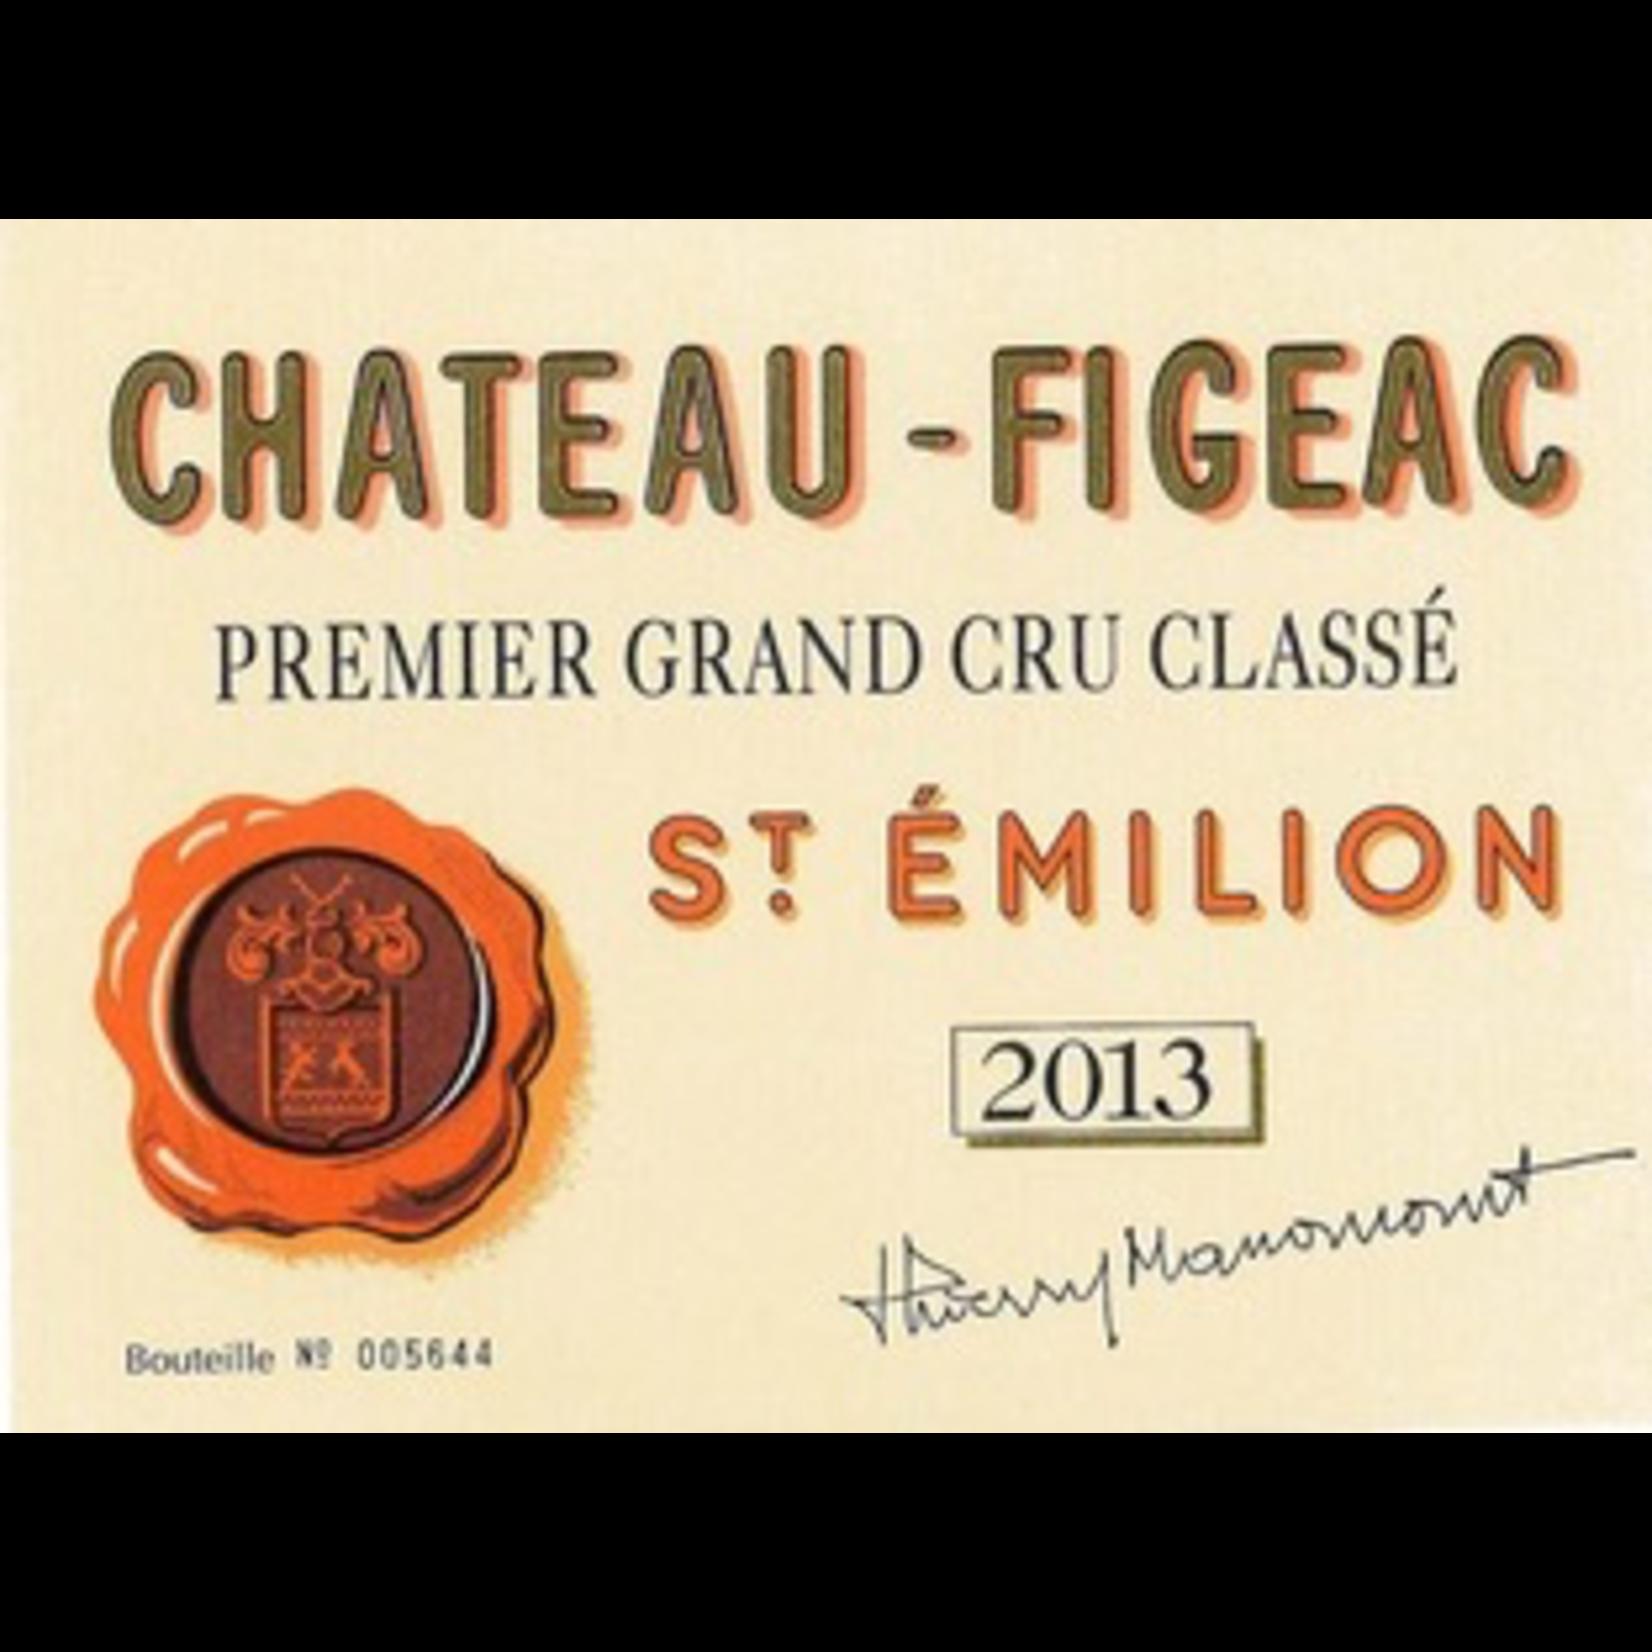 Wine Chateau Figeac 2012